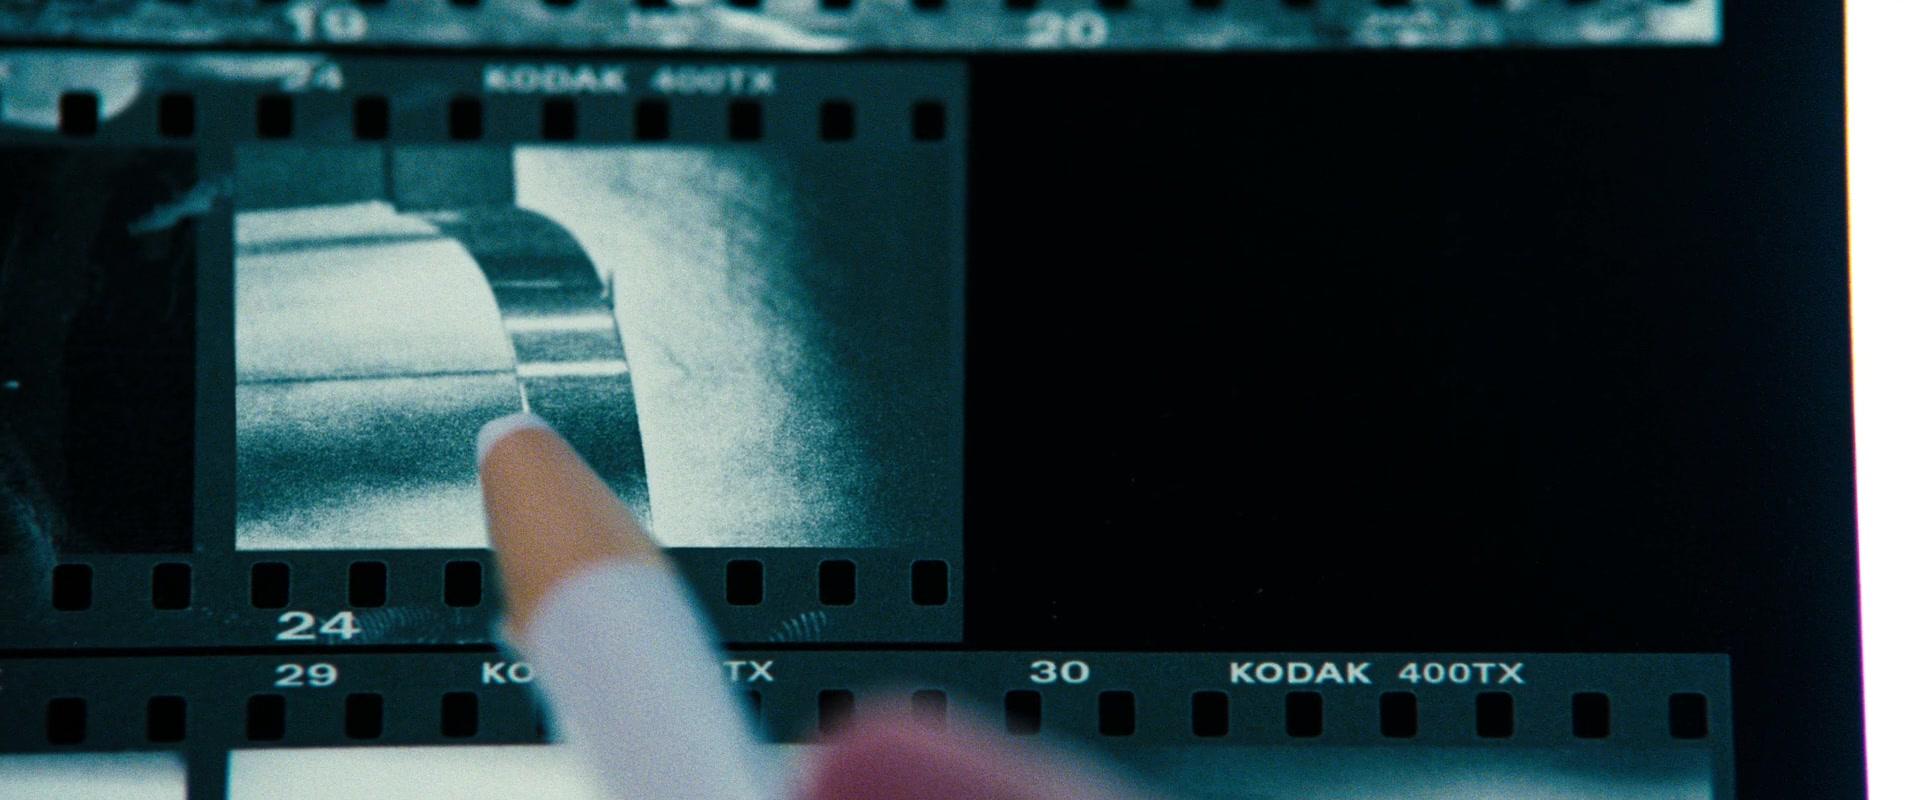 Kodak In The Secret Life Of Walter Mitty 2013